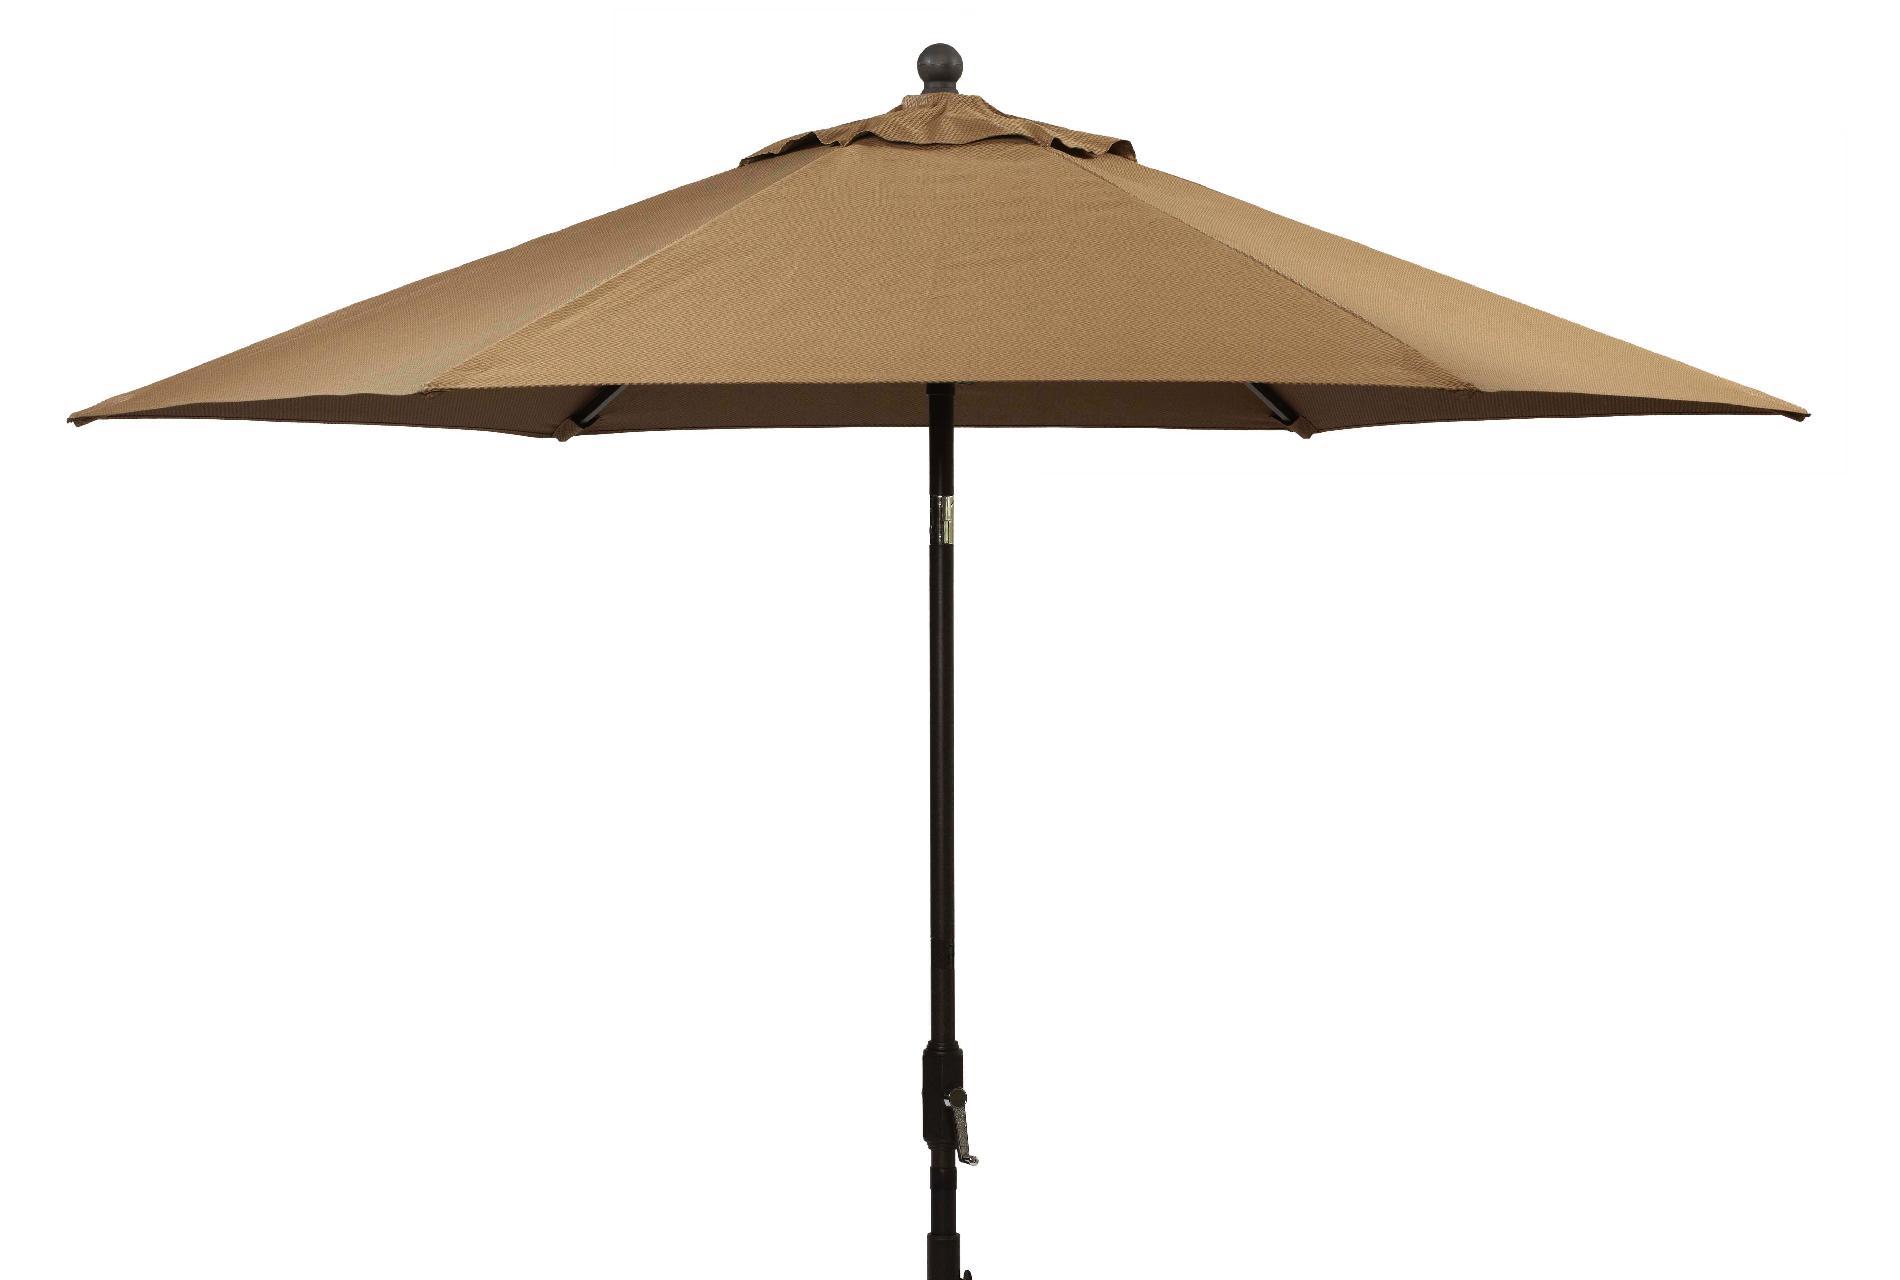 outdoor umbrella agio international arcadia umbrella - sears ATTUEJR